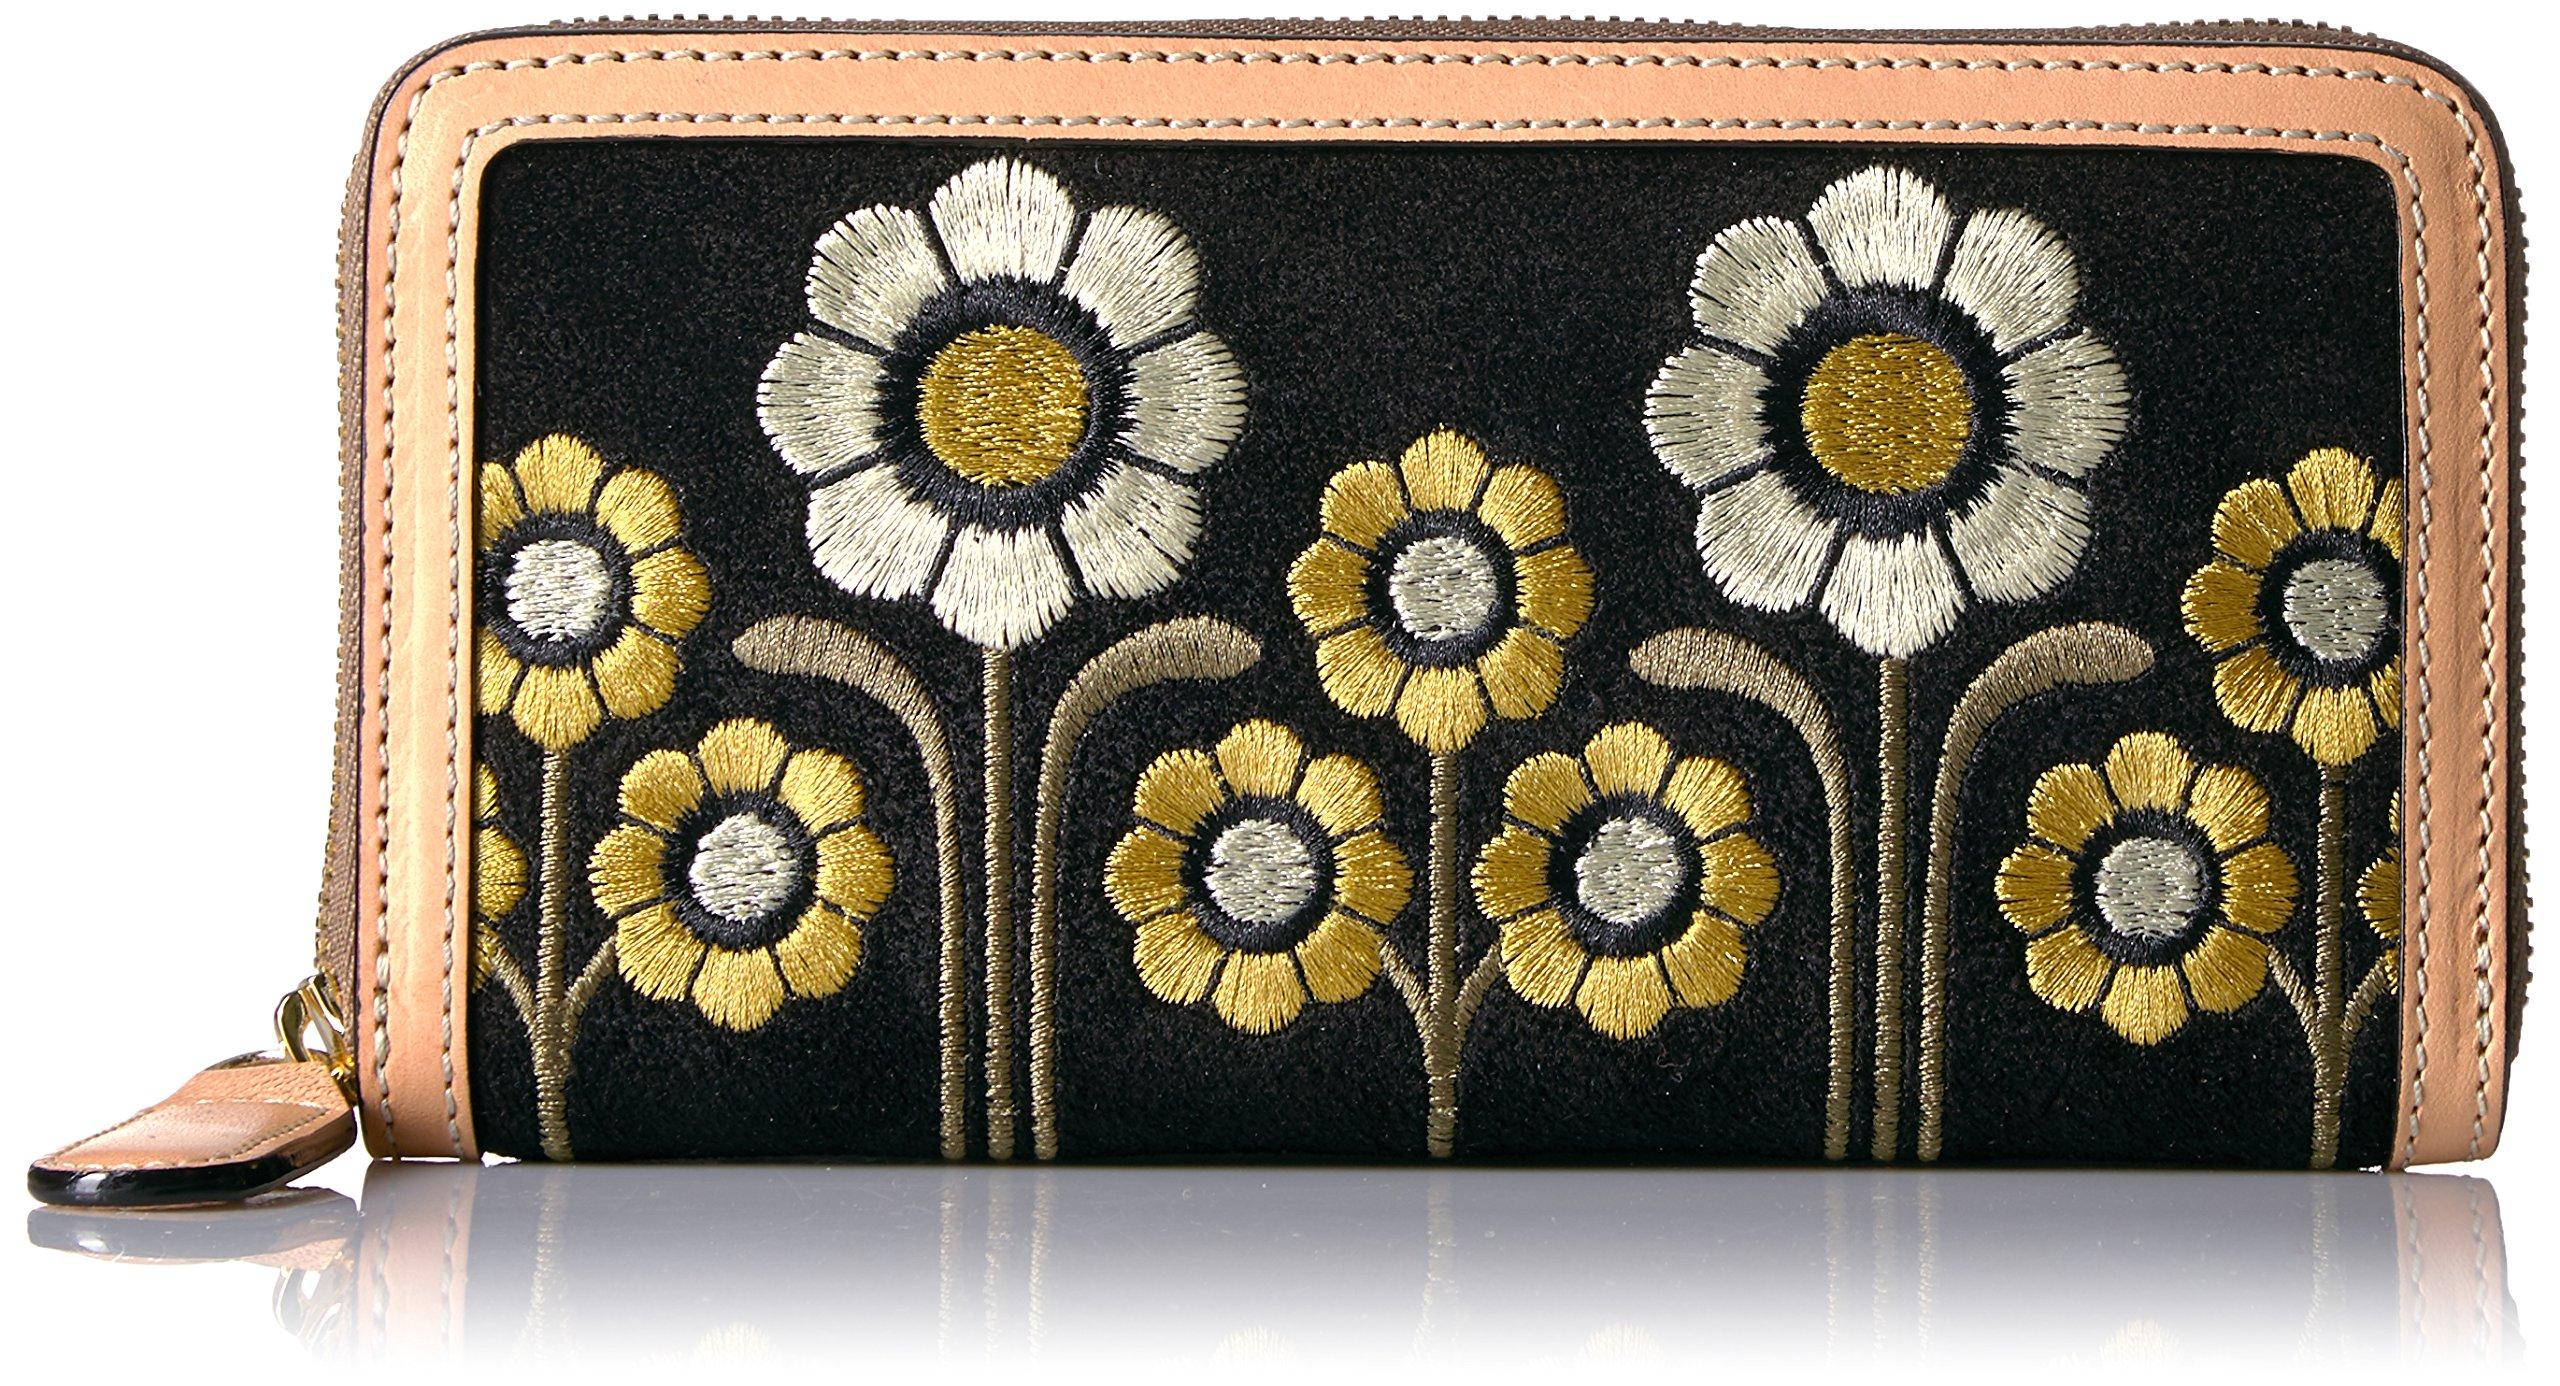 Suede Embroidery Big Zip Wallet Wallet, Black, One Size